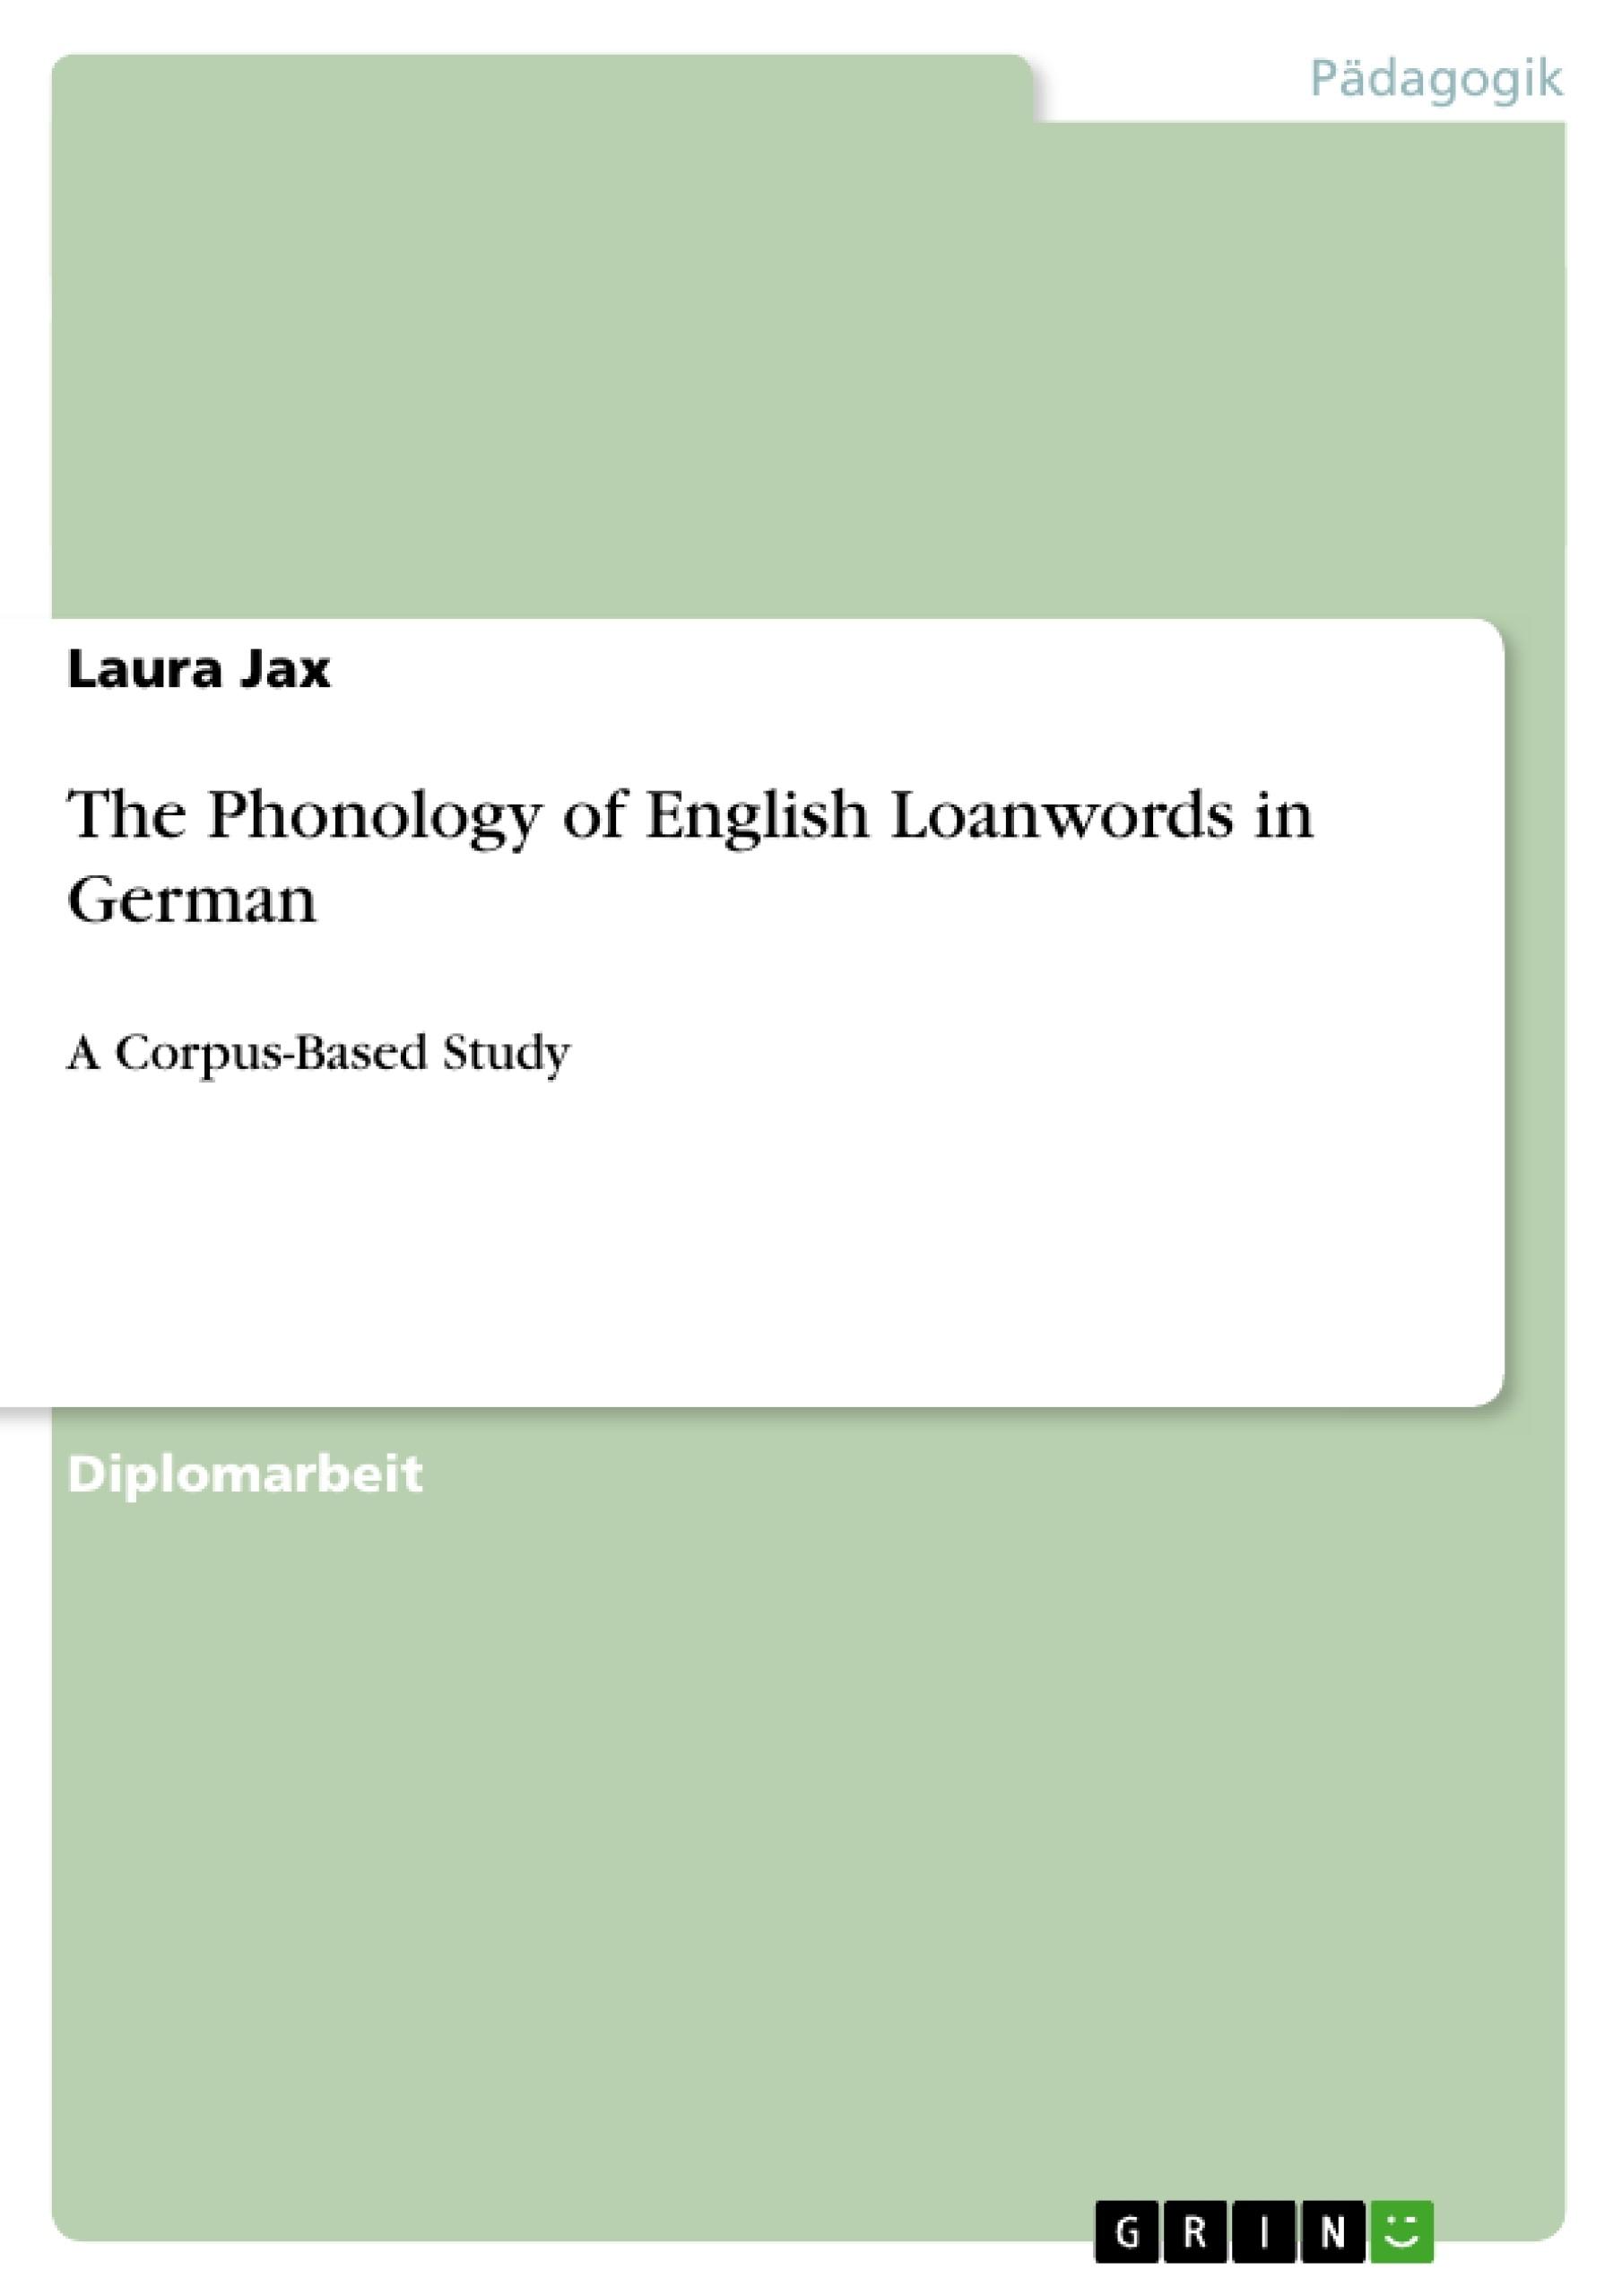 Titel: The Phonology of English Loanwords in German